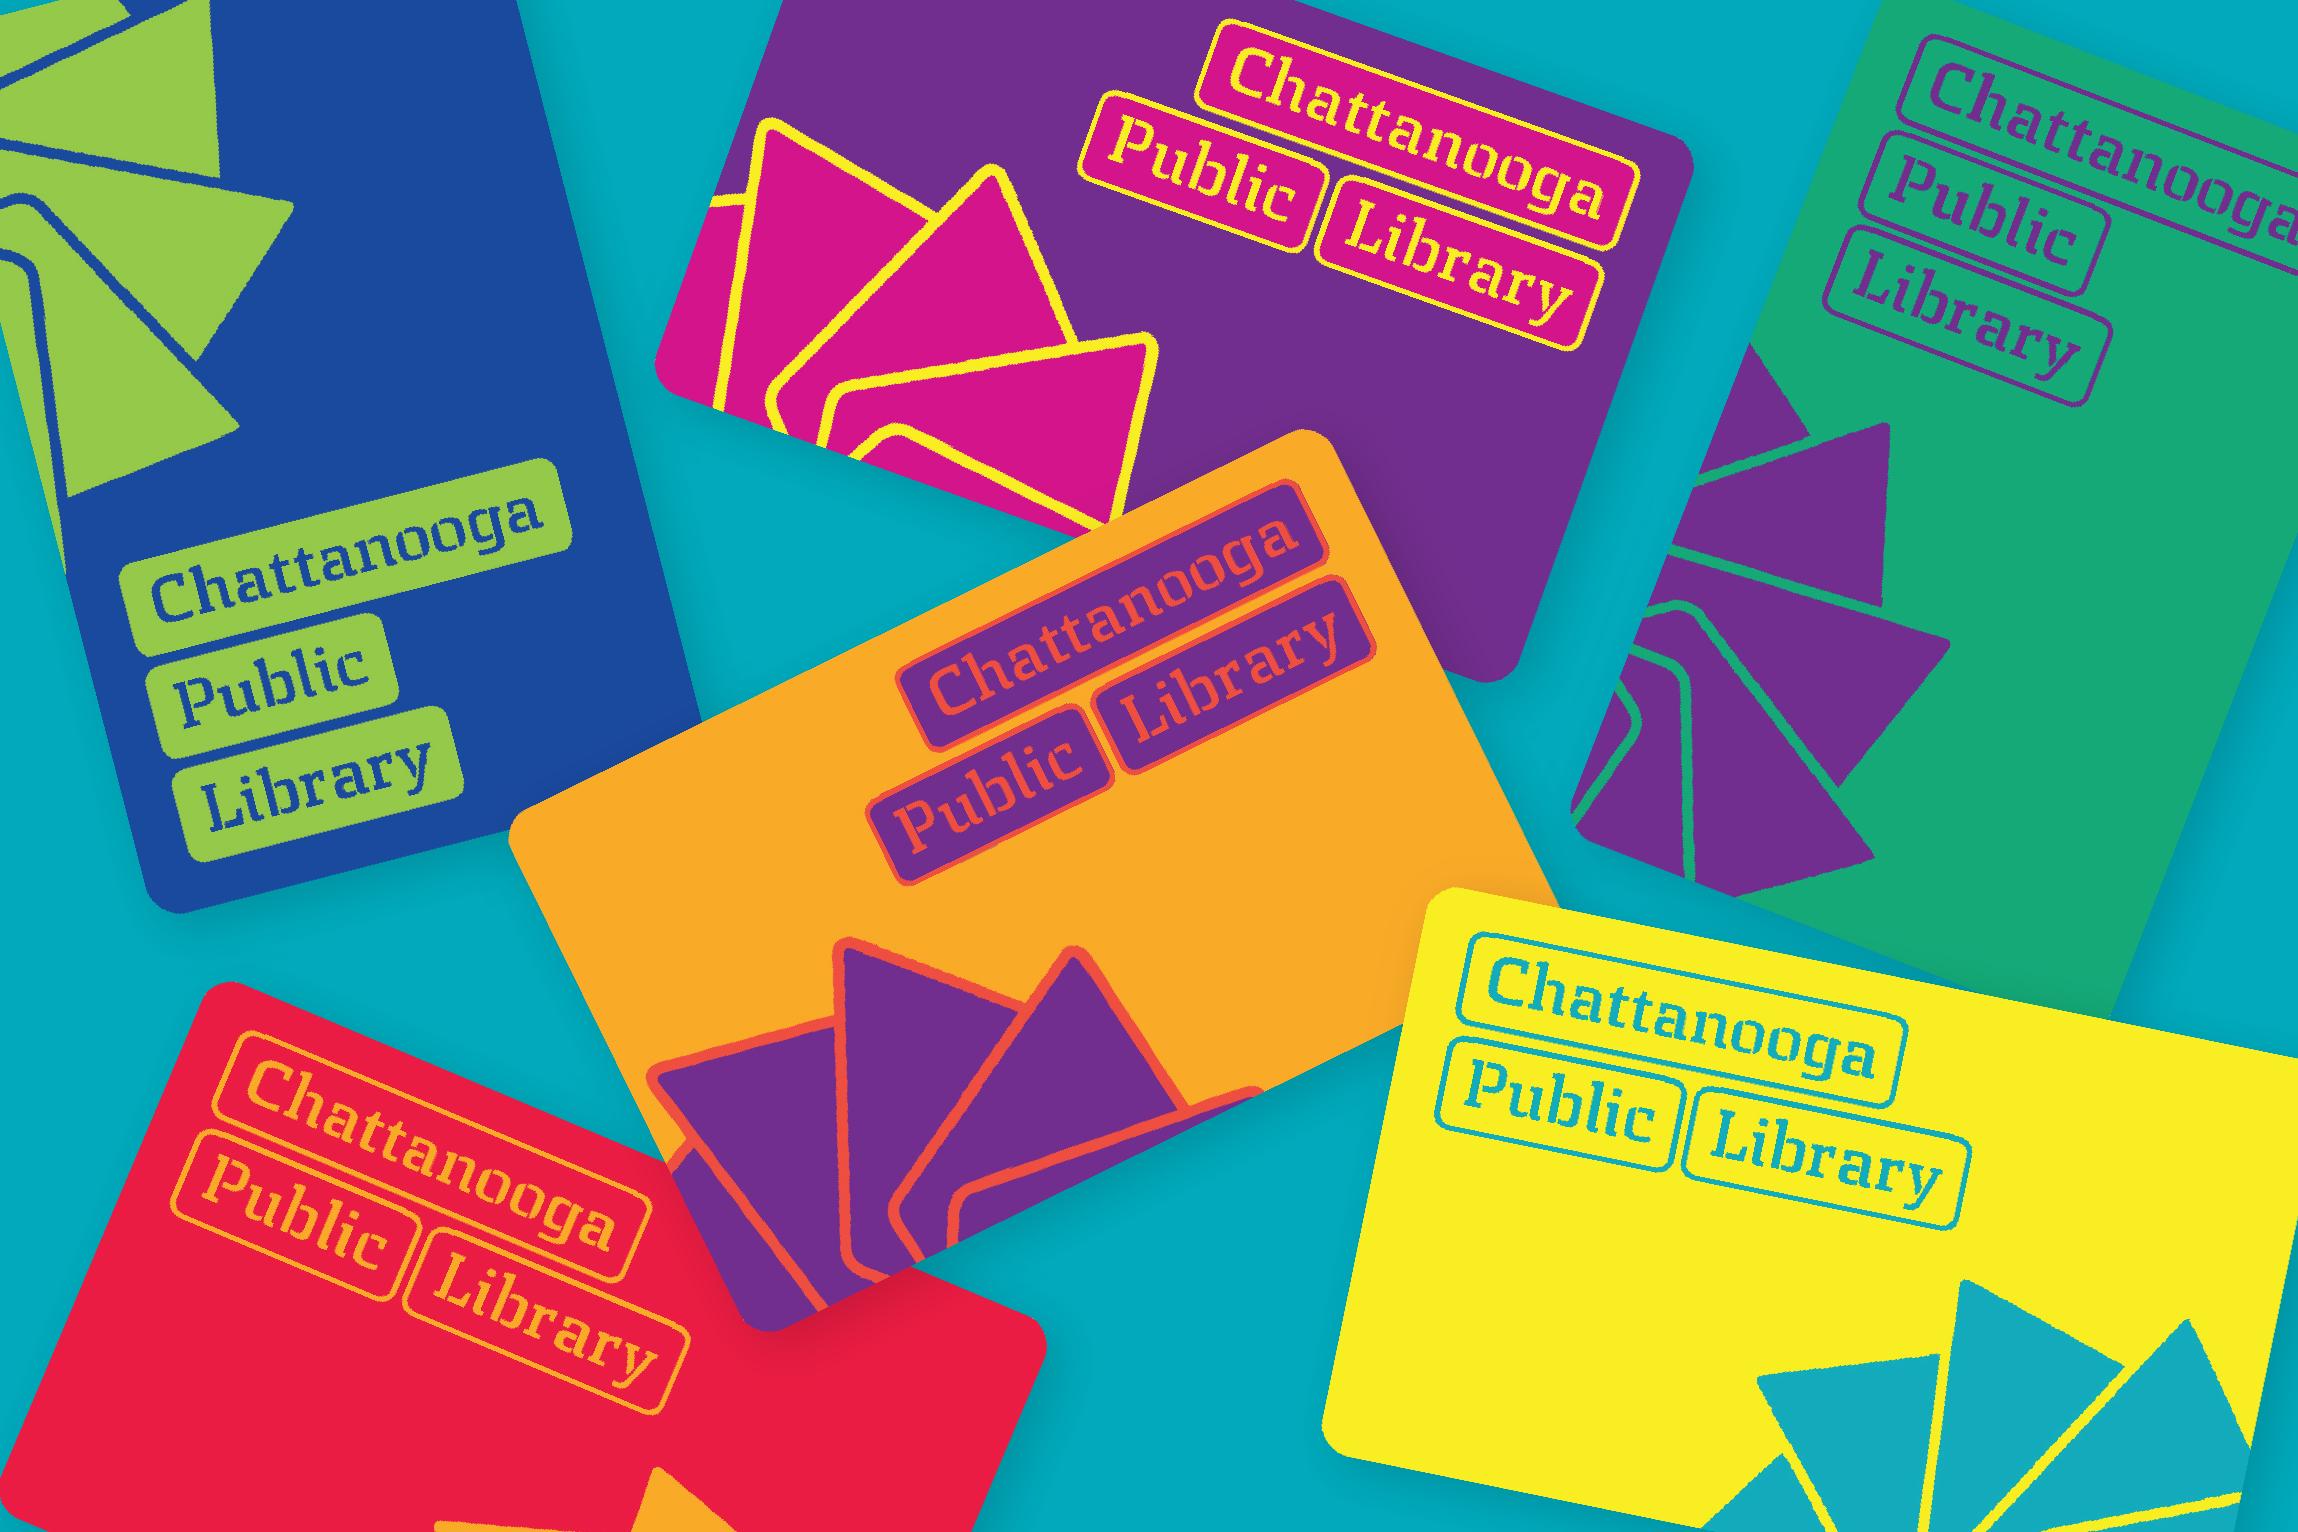 Chattanooga Public Library Brand Identity Design